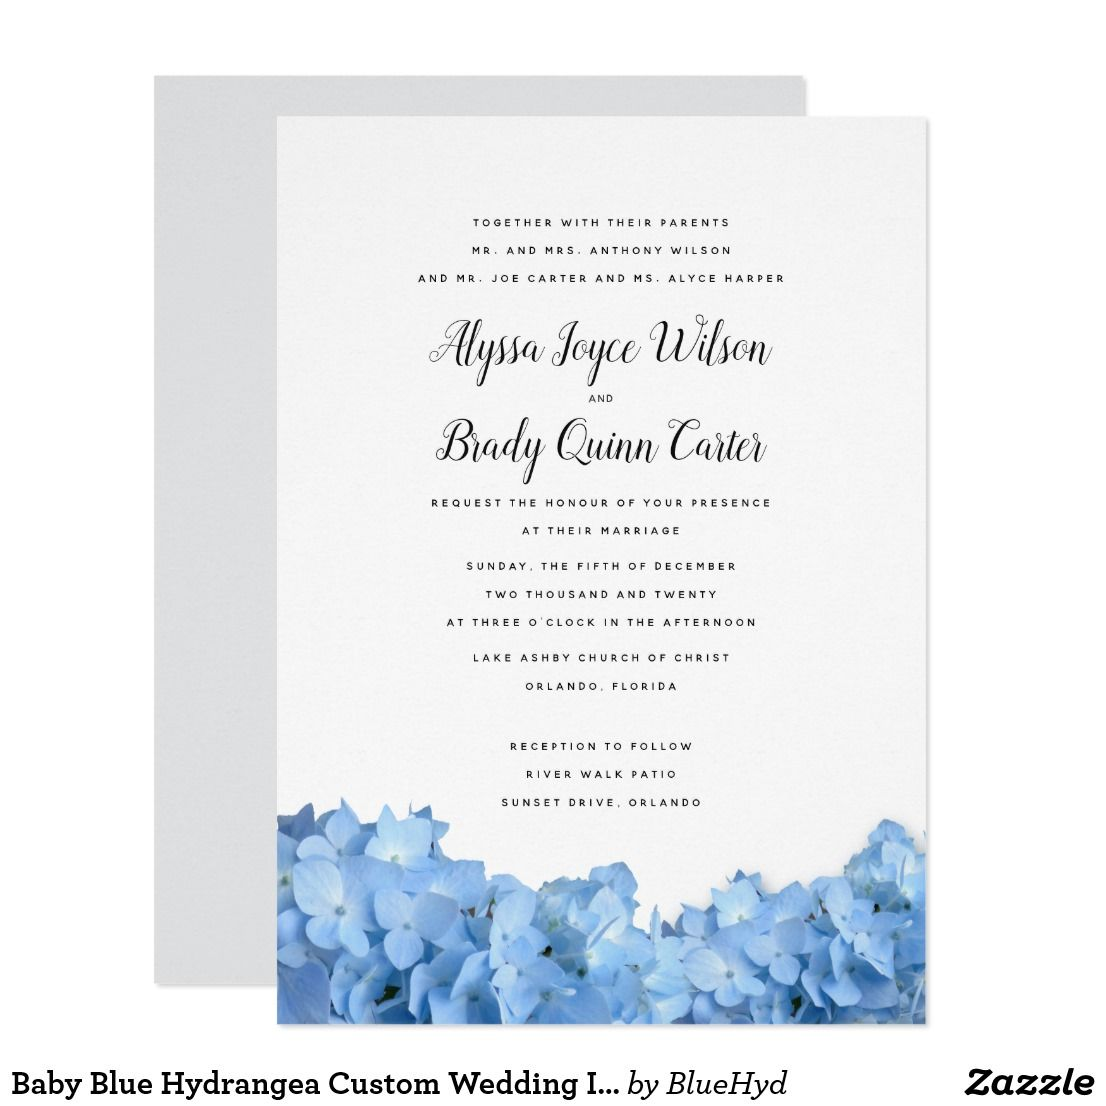 Baby Blue Hydrangea Custom Wedding Invitations | Hydrangea ...